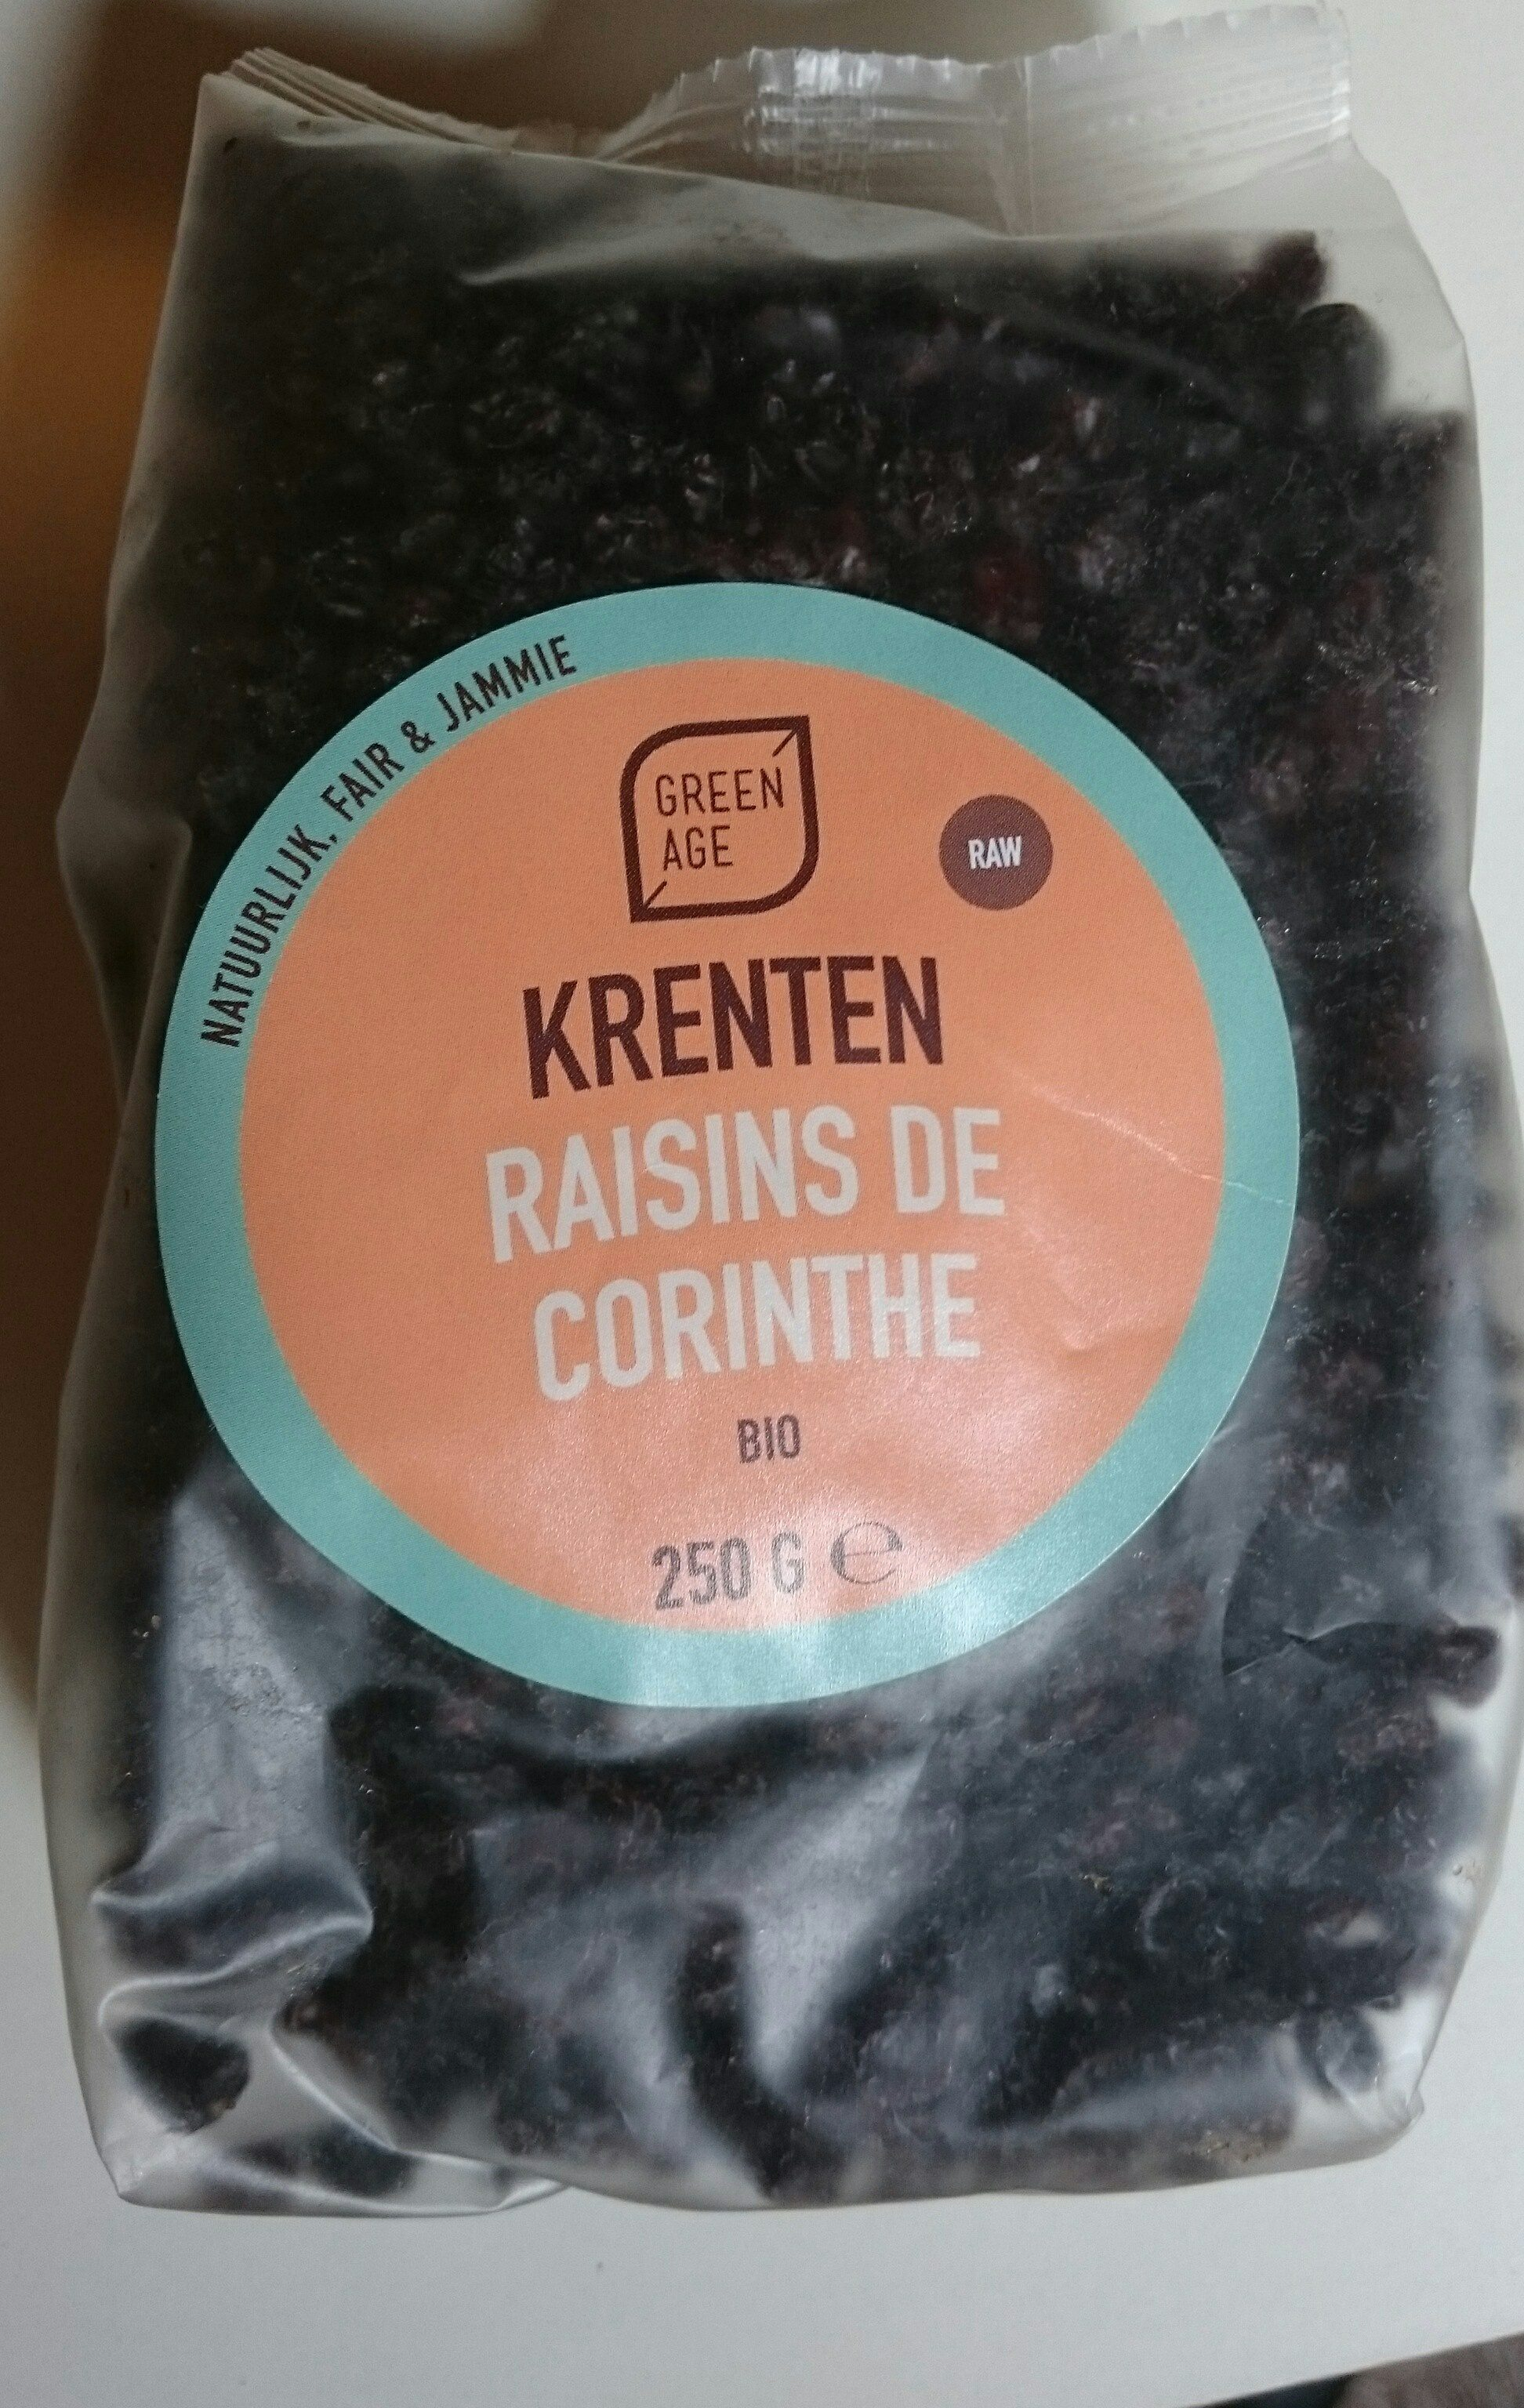 Raisins de Corinthe - Product - fr